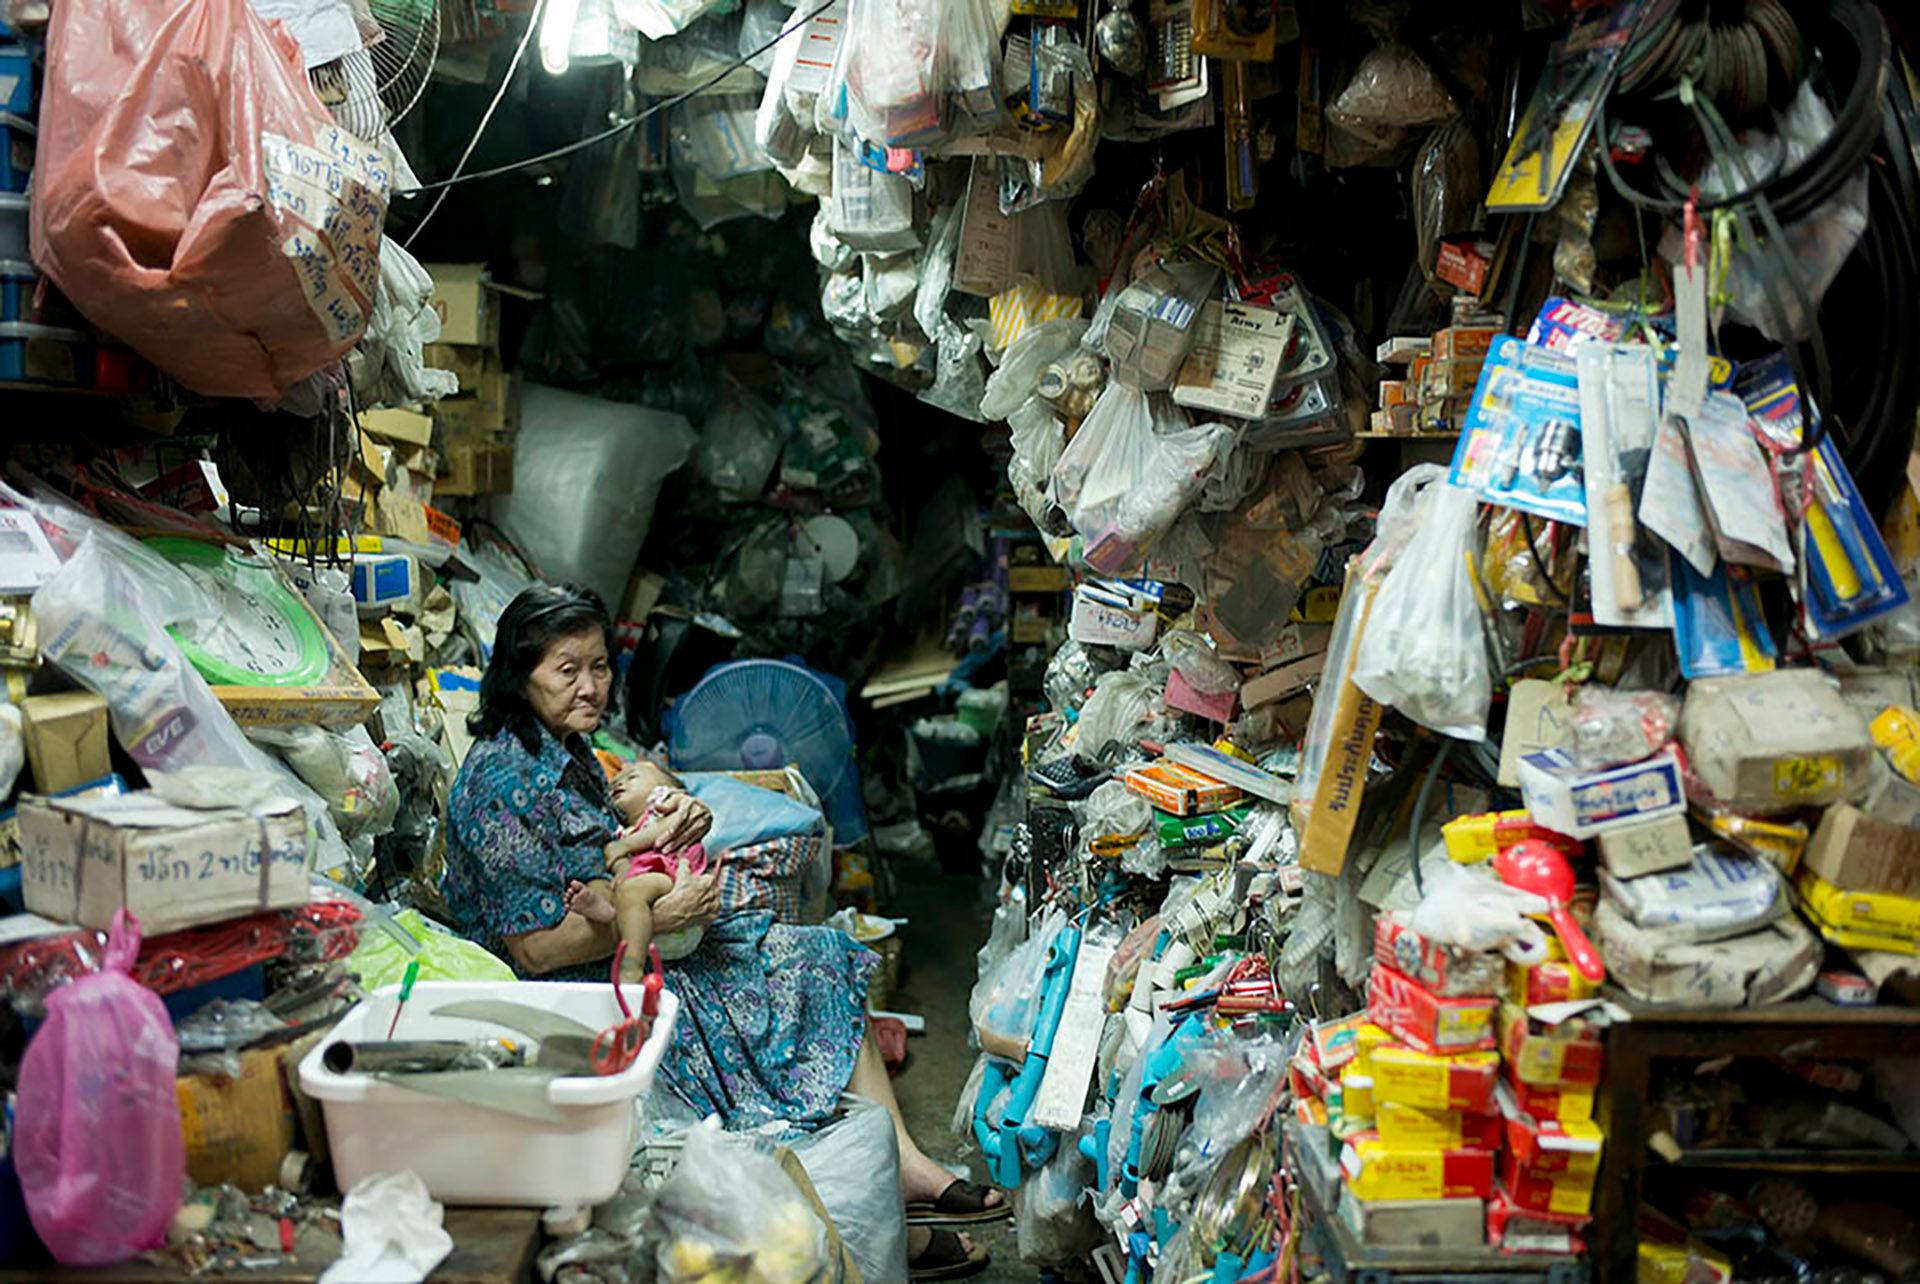 Woman in Shop with Child, Pratunamwith Child Pratunam